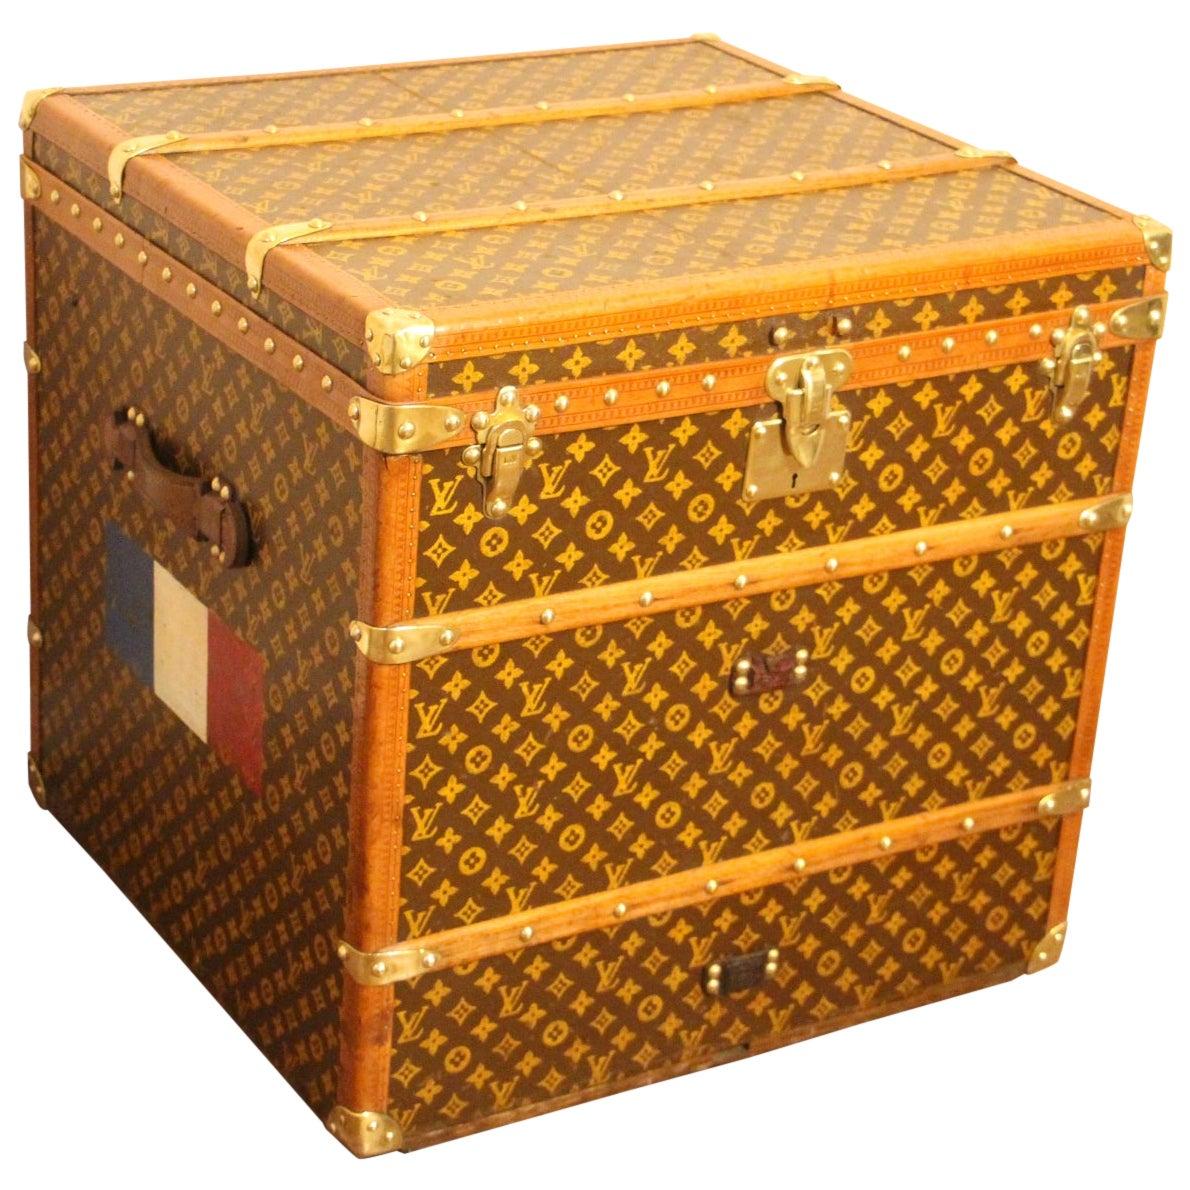 Louis Vuitton Steamer Trunk, Louis Vuitton Cube Trunk, Louis Vuitton Trunk